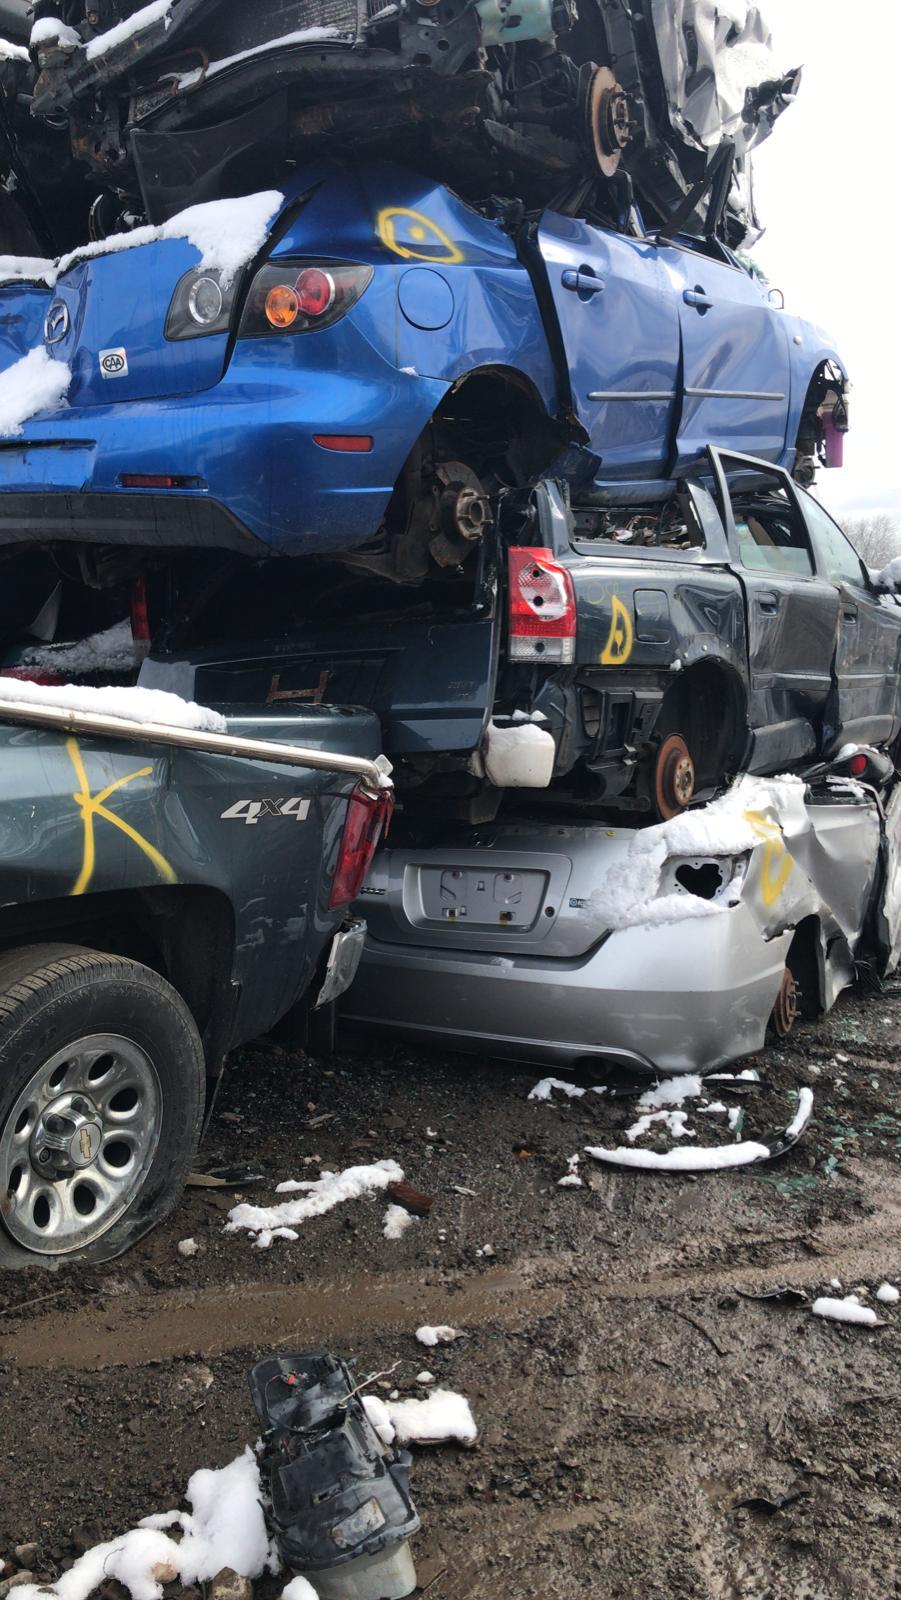 Car Wreckers In Toronto and GTA - Scrap My Junk Cars Company